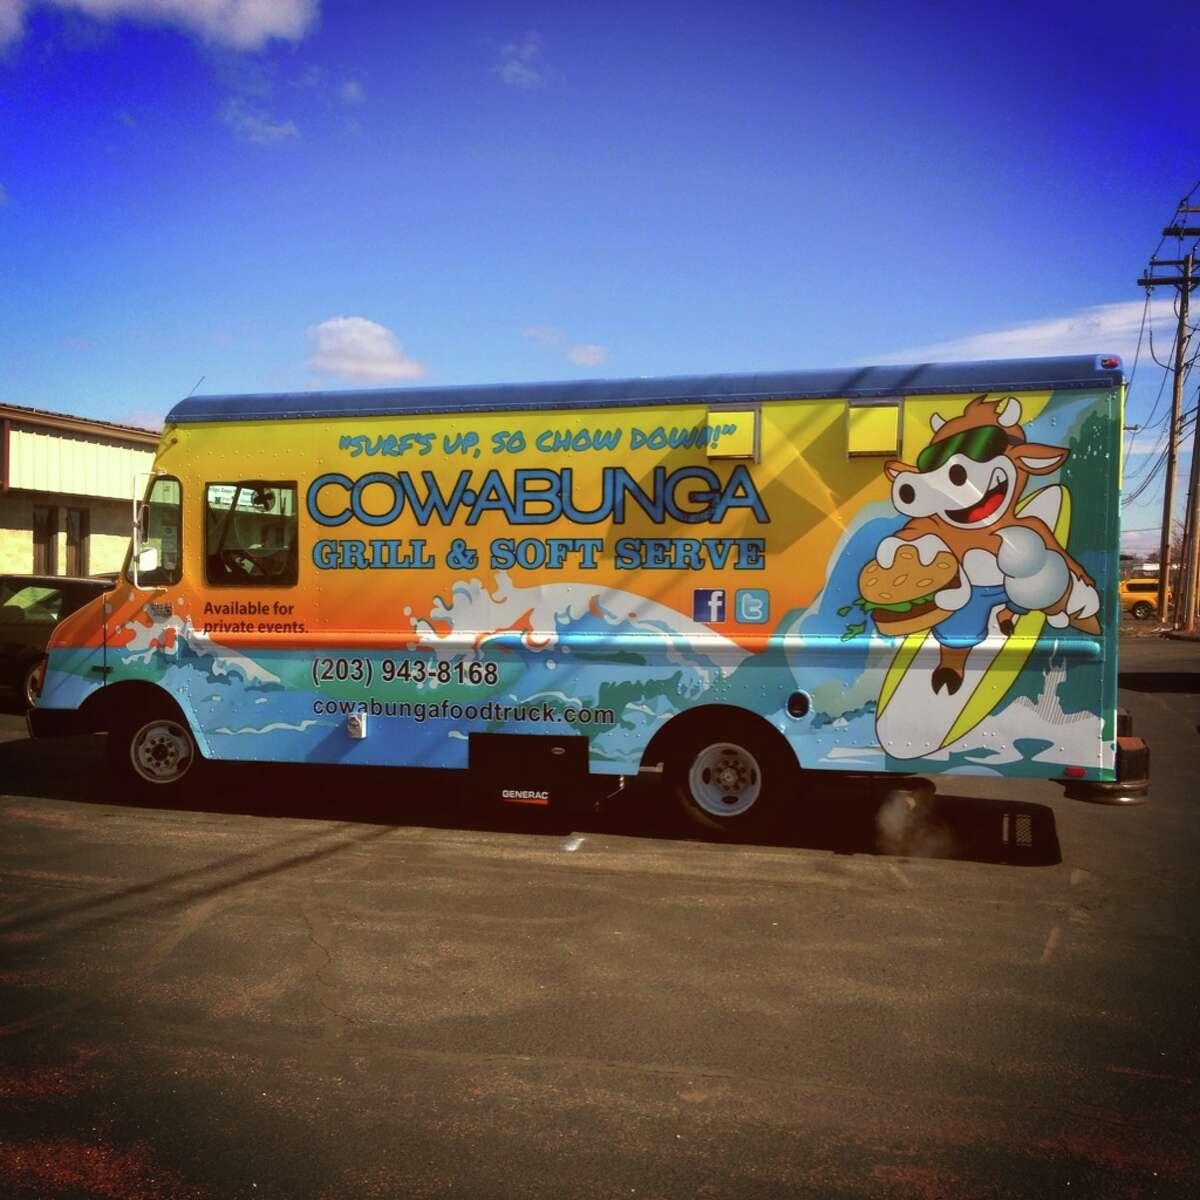 Cowabunga Food TruckThe Cowabunga Food Truck surfs around Fairfield County catering private parties.Favorite menu item: Grass-fed hamburger